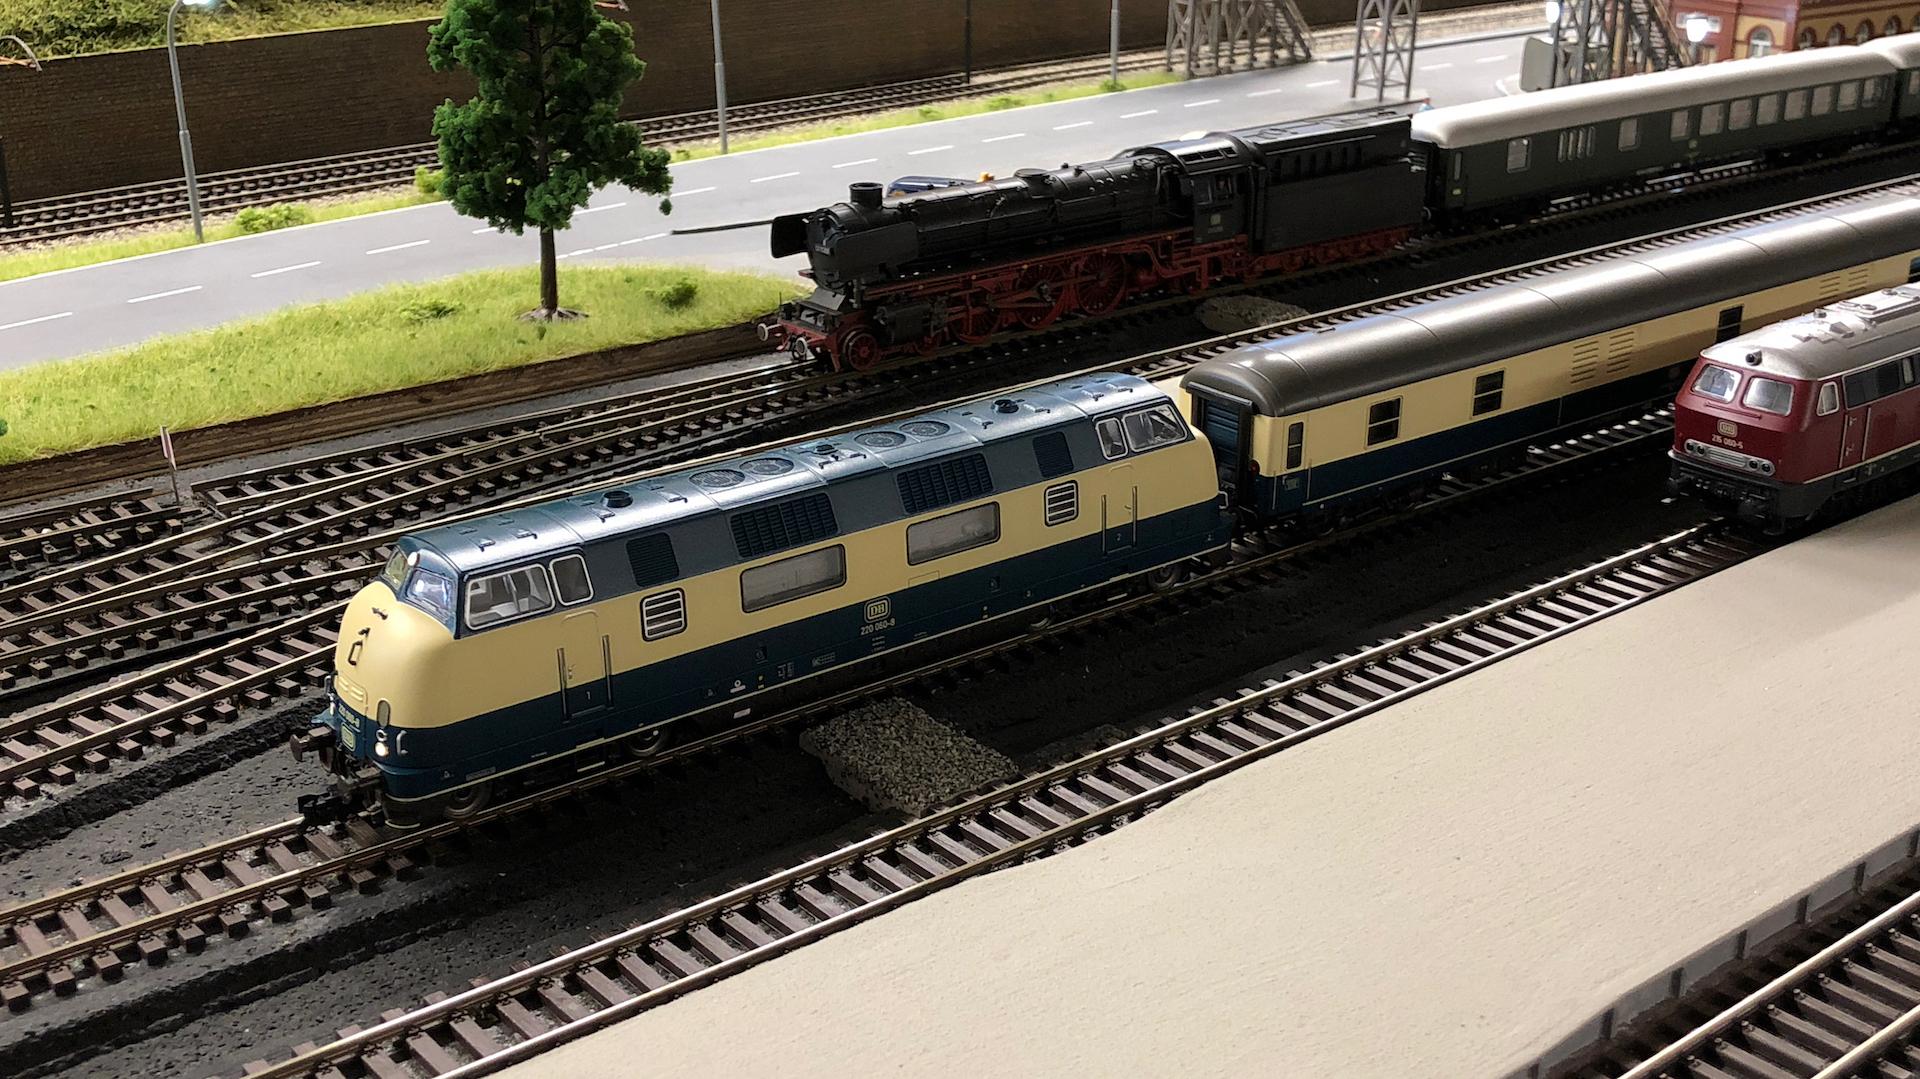 18_02_24_Schautag-Eisenbahnfreunde-Hameln_011